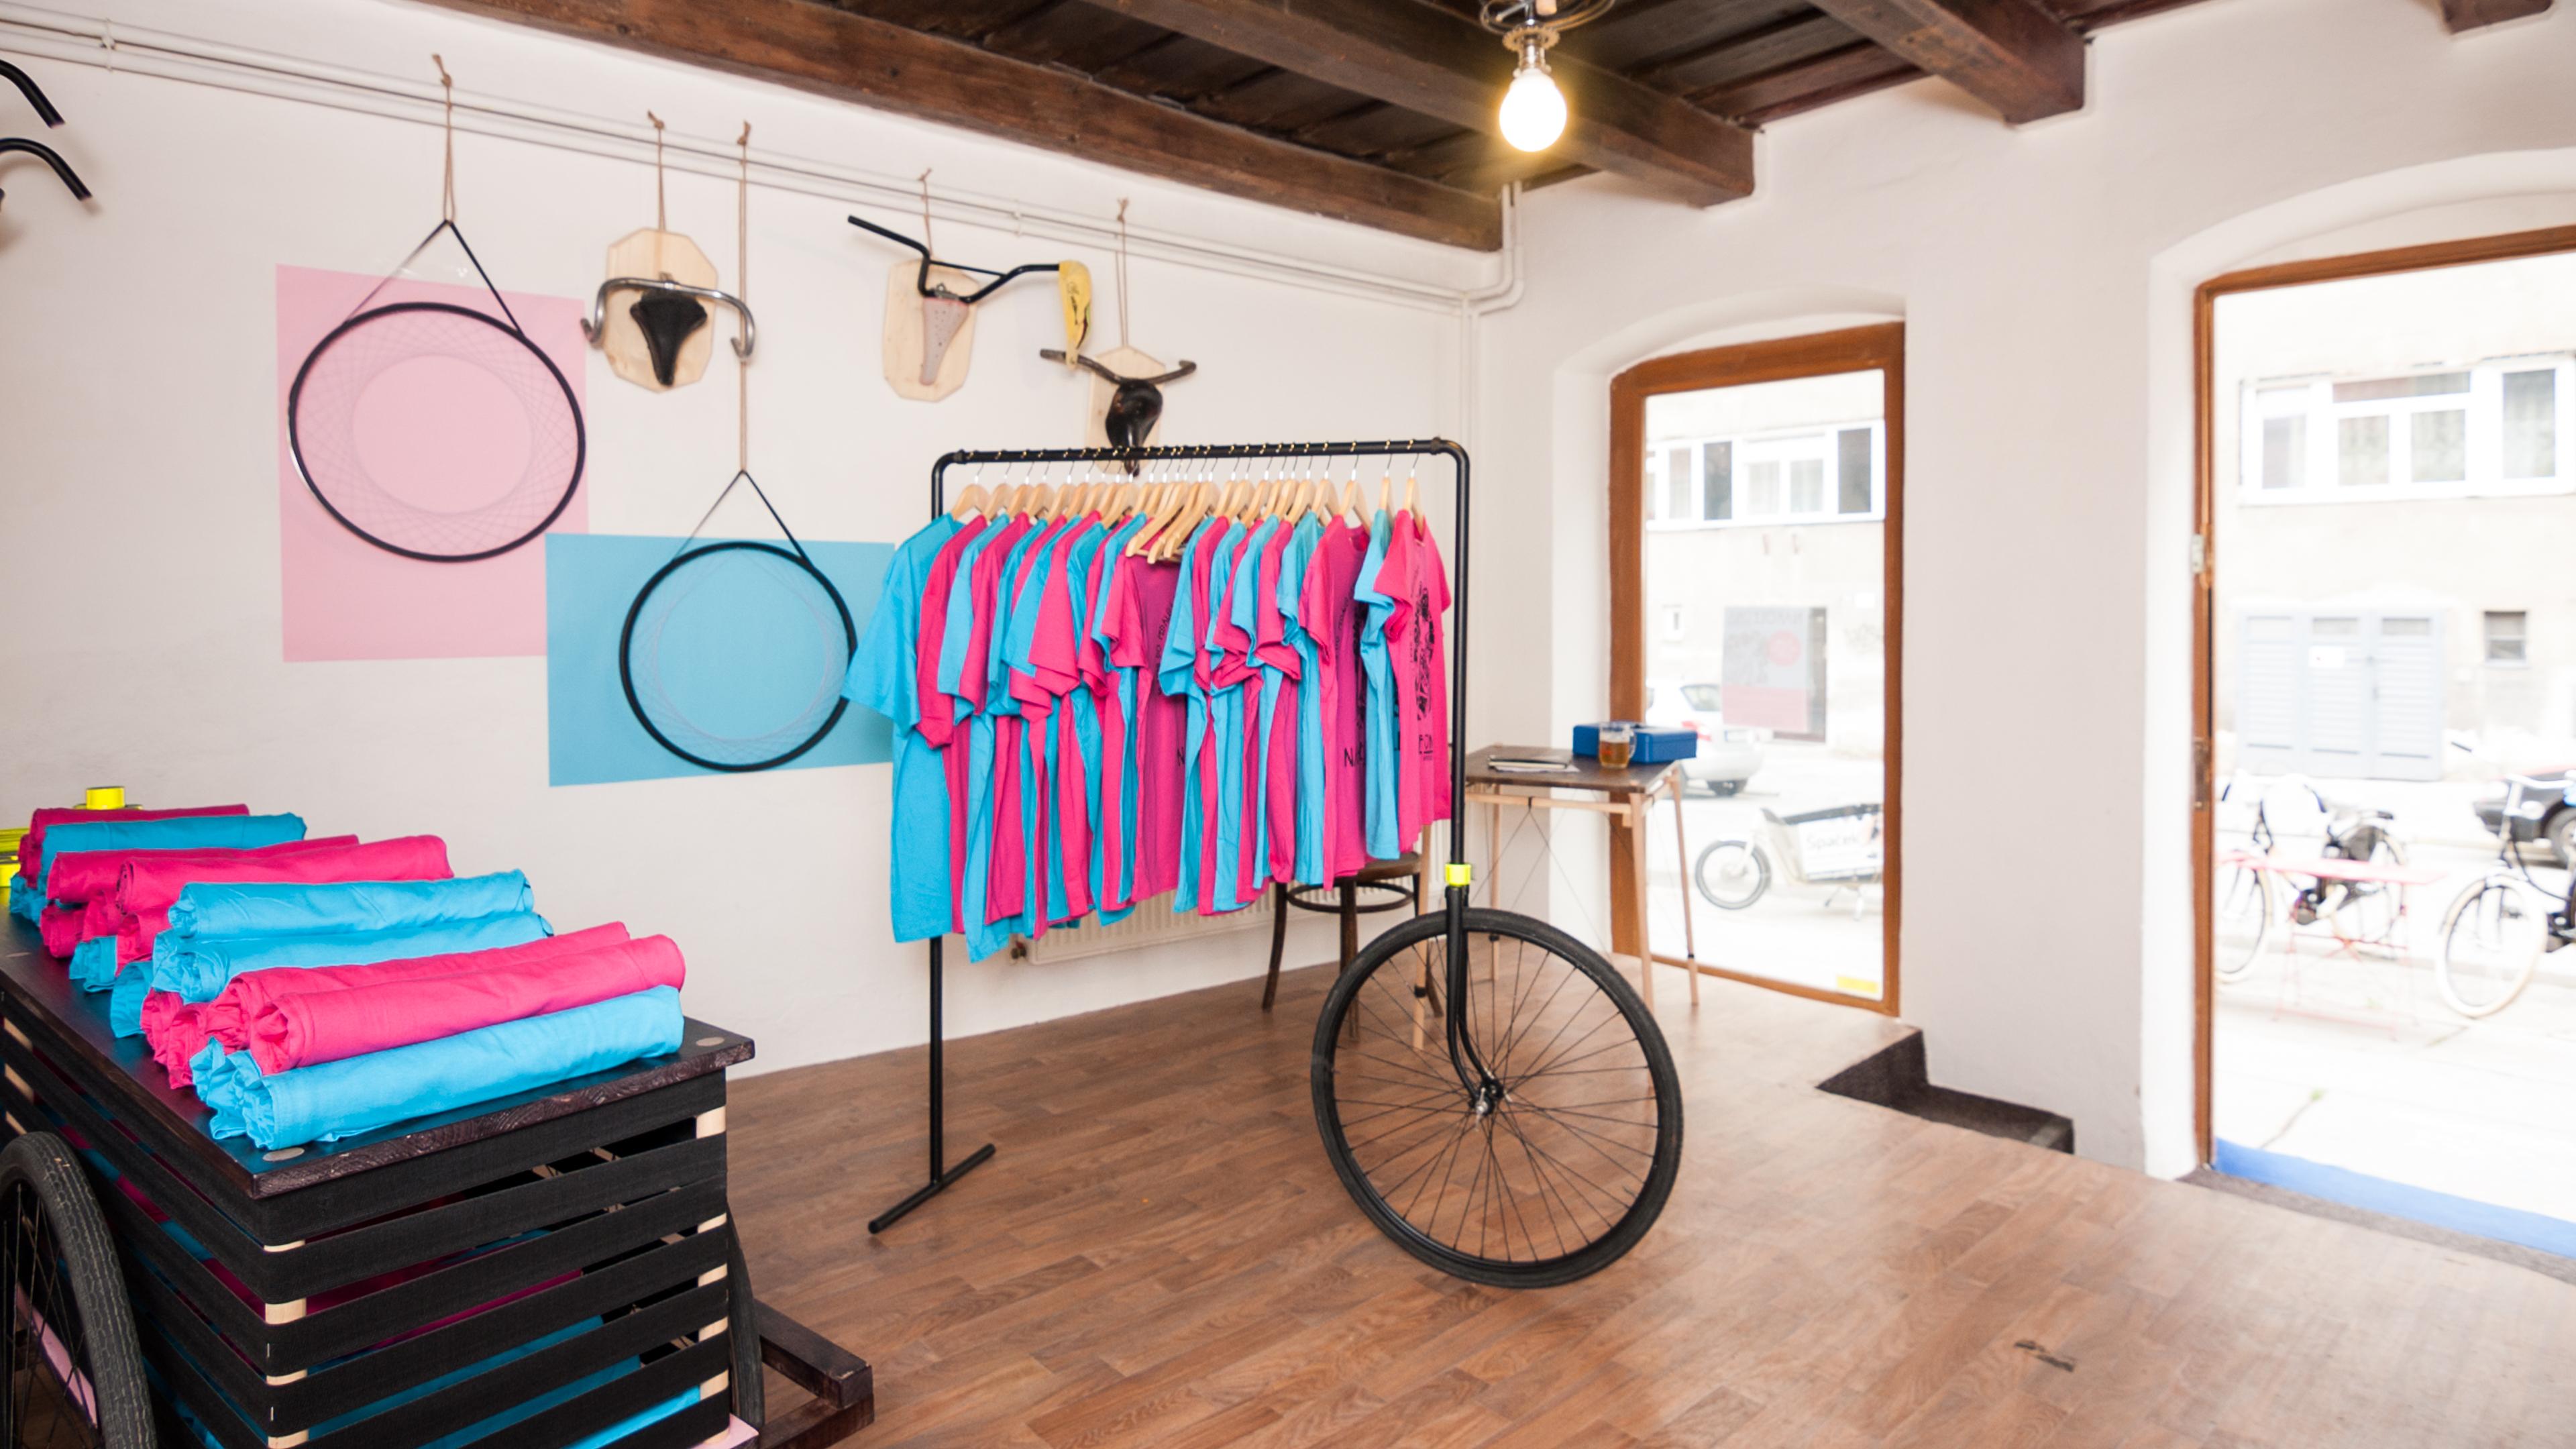 bike-popup-shop-tototu-studio-brno